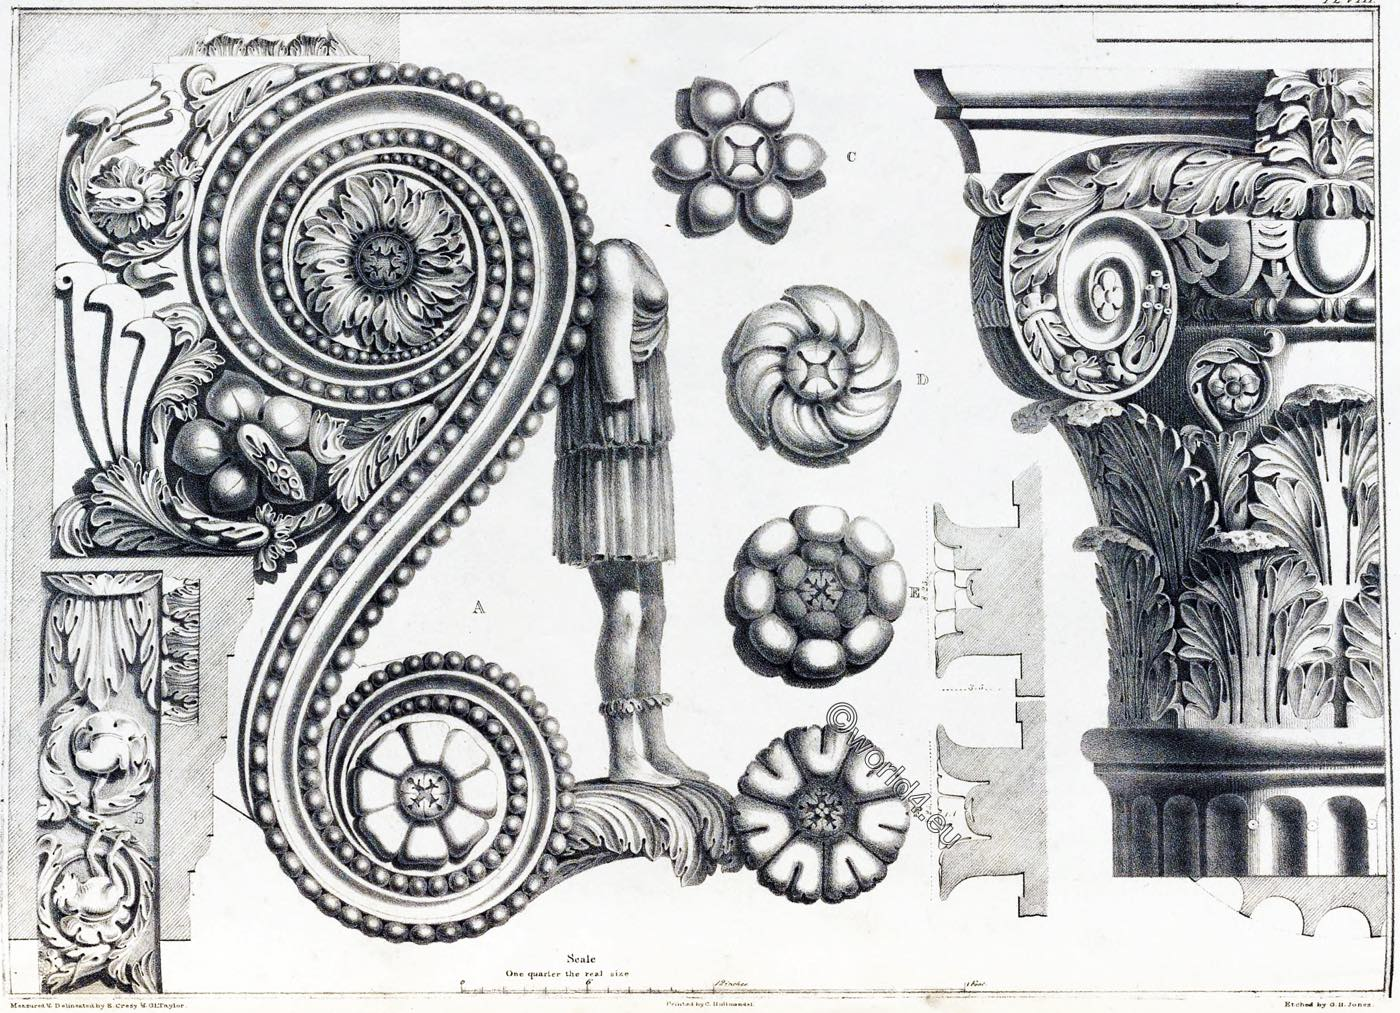 Arch, Titus, columns, key-stone, Rome, Ornament, Decoration, Architecture, antiquities,